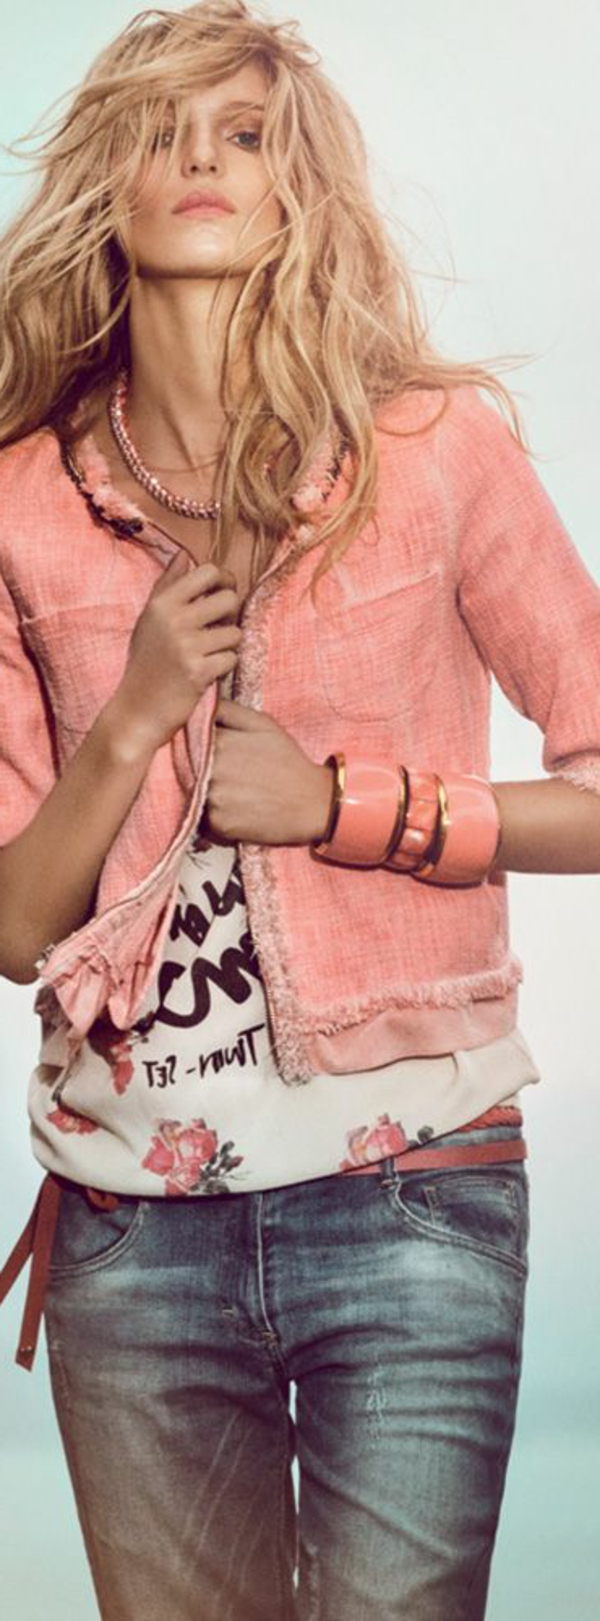 veste-corail-en-tweed-et-outfit-urbain